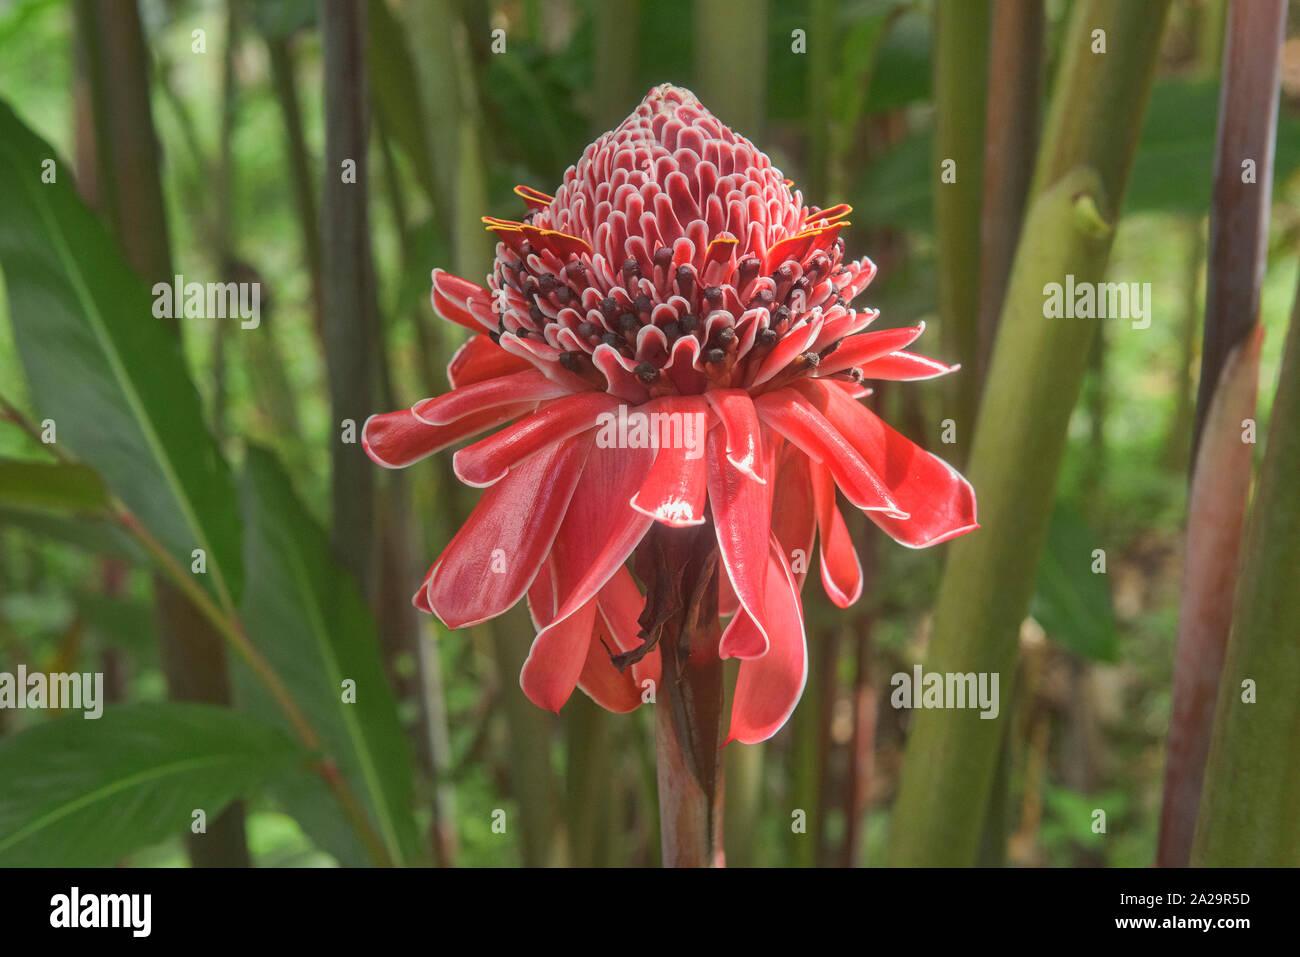 Hermoso color rojo antorcha jengibre (Etlingera elatior) Flor, Parque Nacional Podocarpus, Zamora, Ecuador Foto de stock